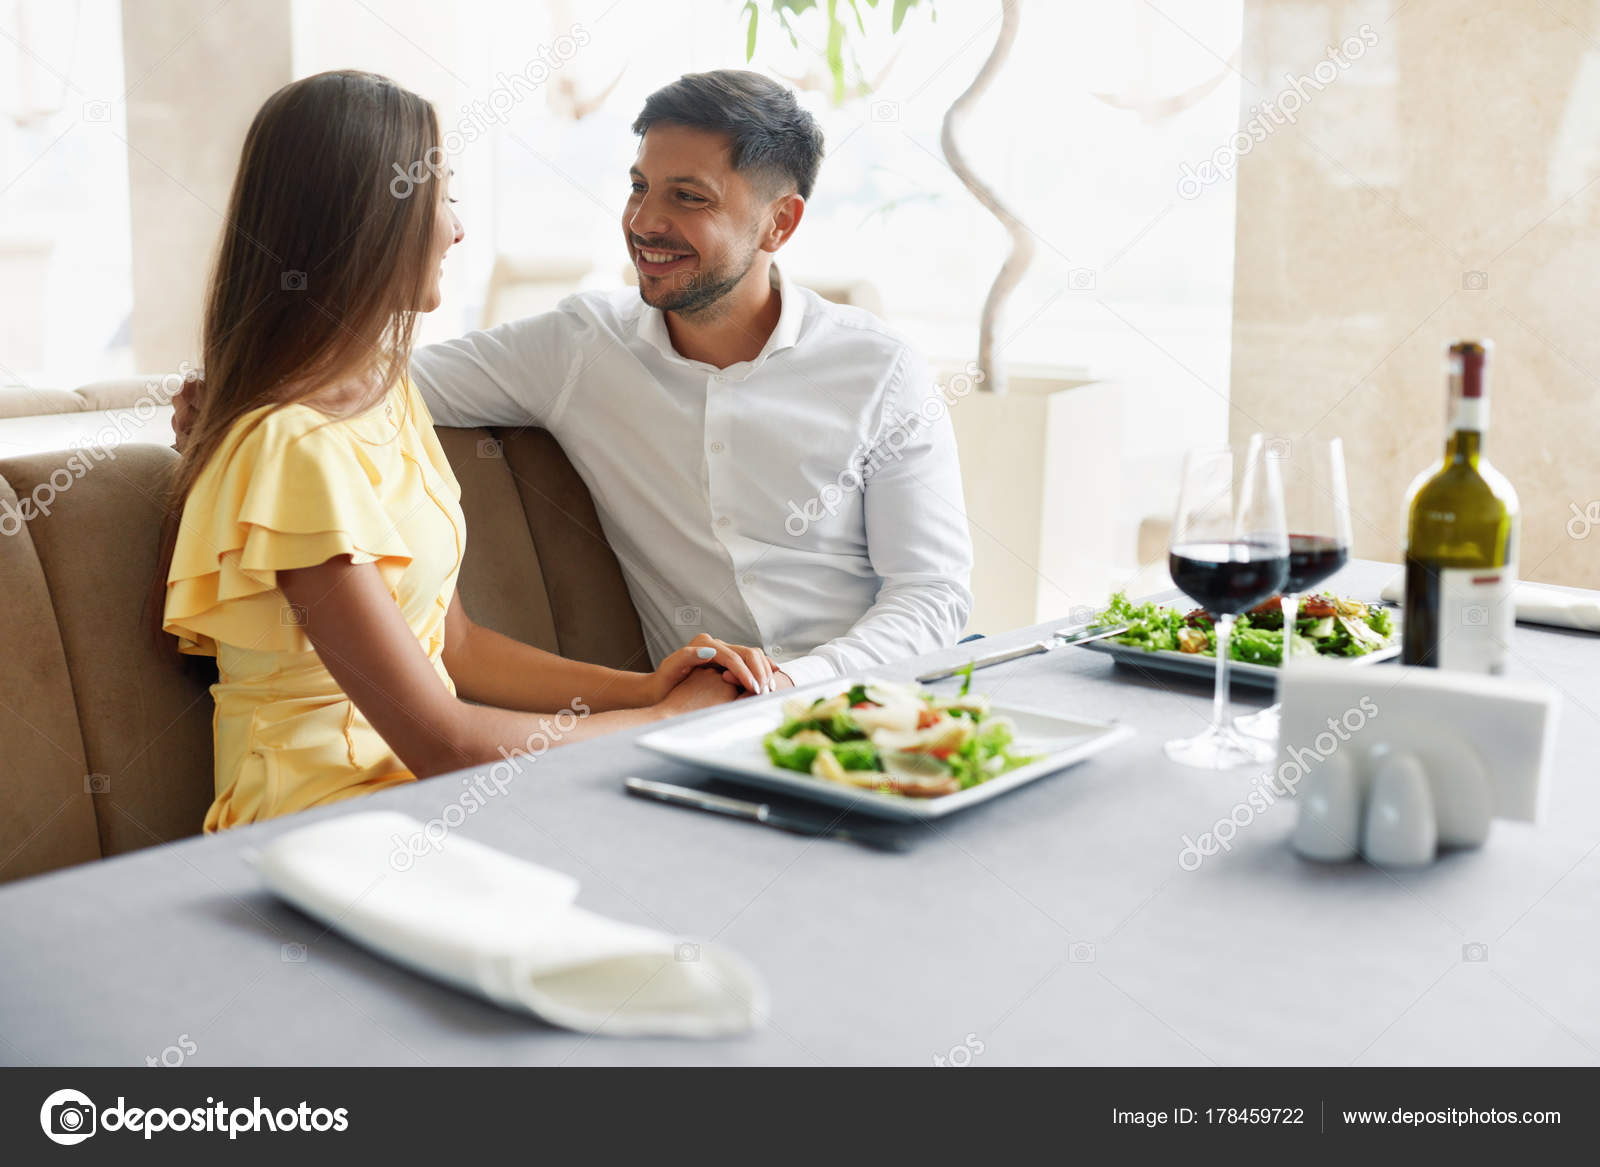 Romantic Couple Having Dinner For Two In Restaurant Stock Photo C Puhhha 178459722